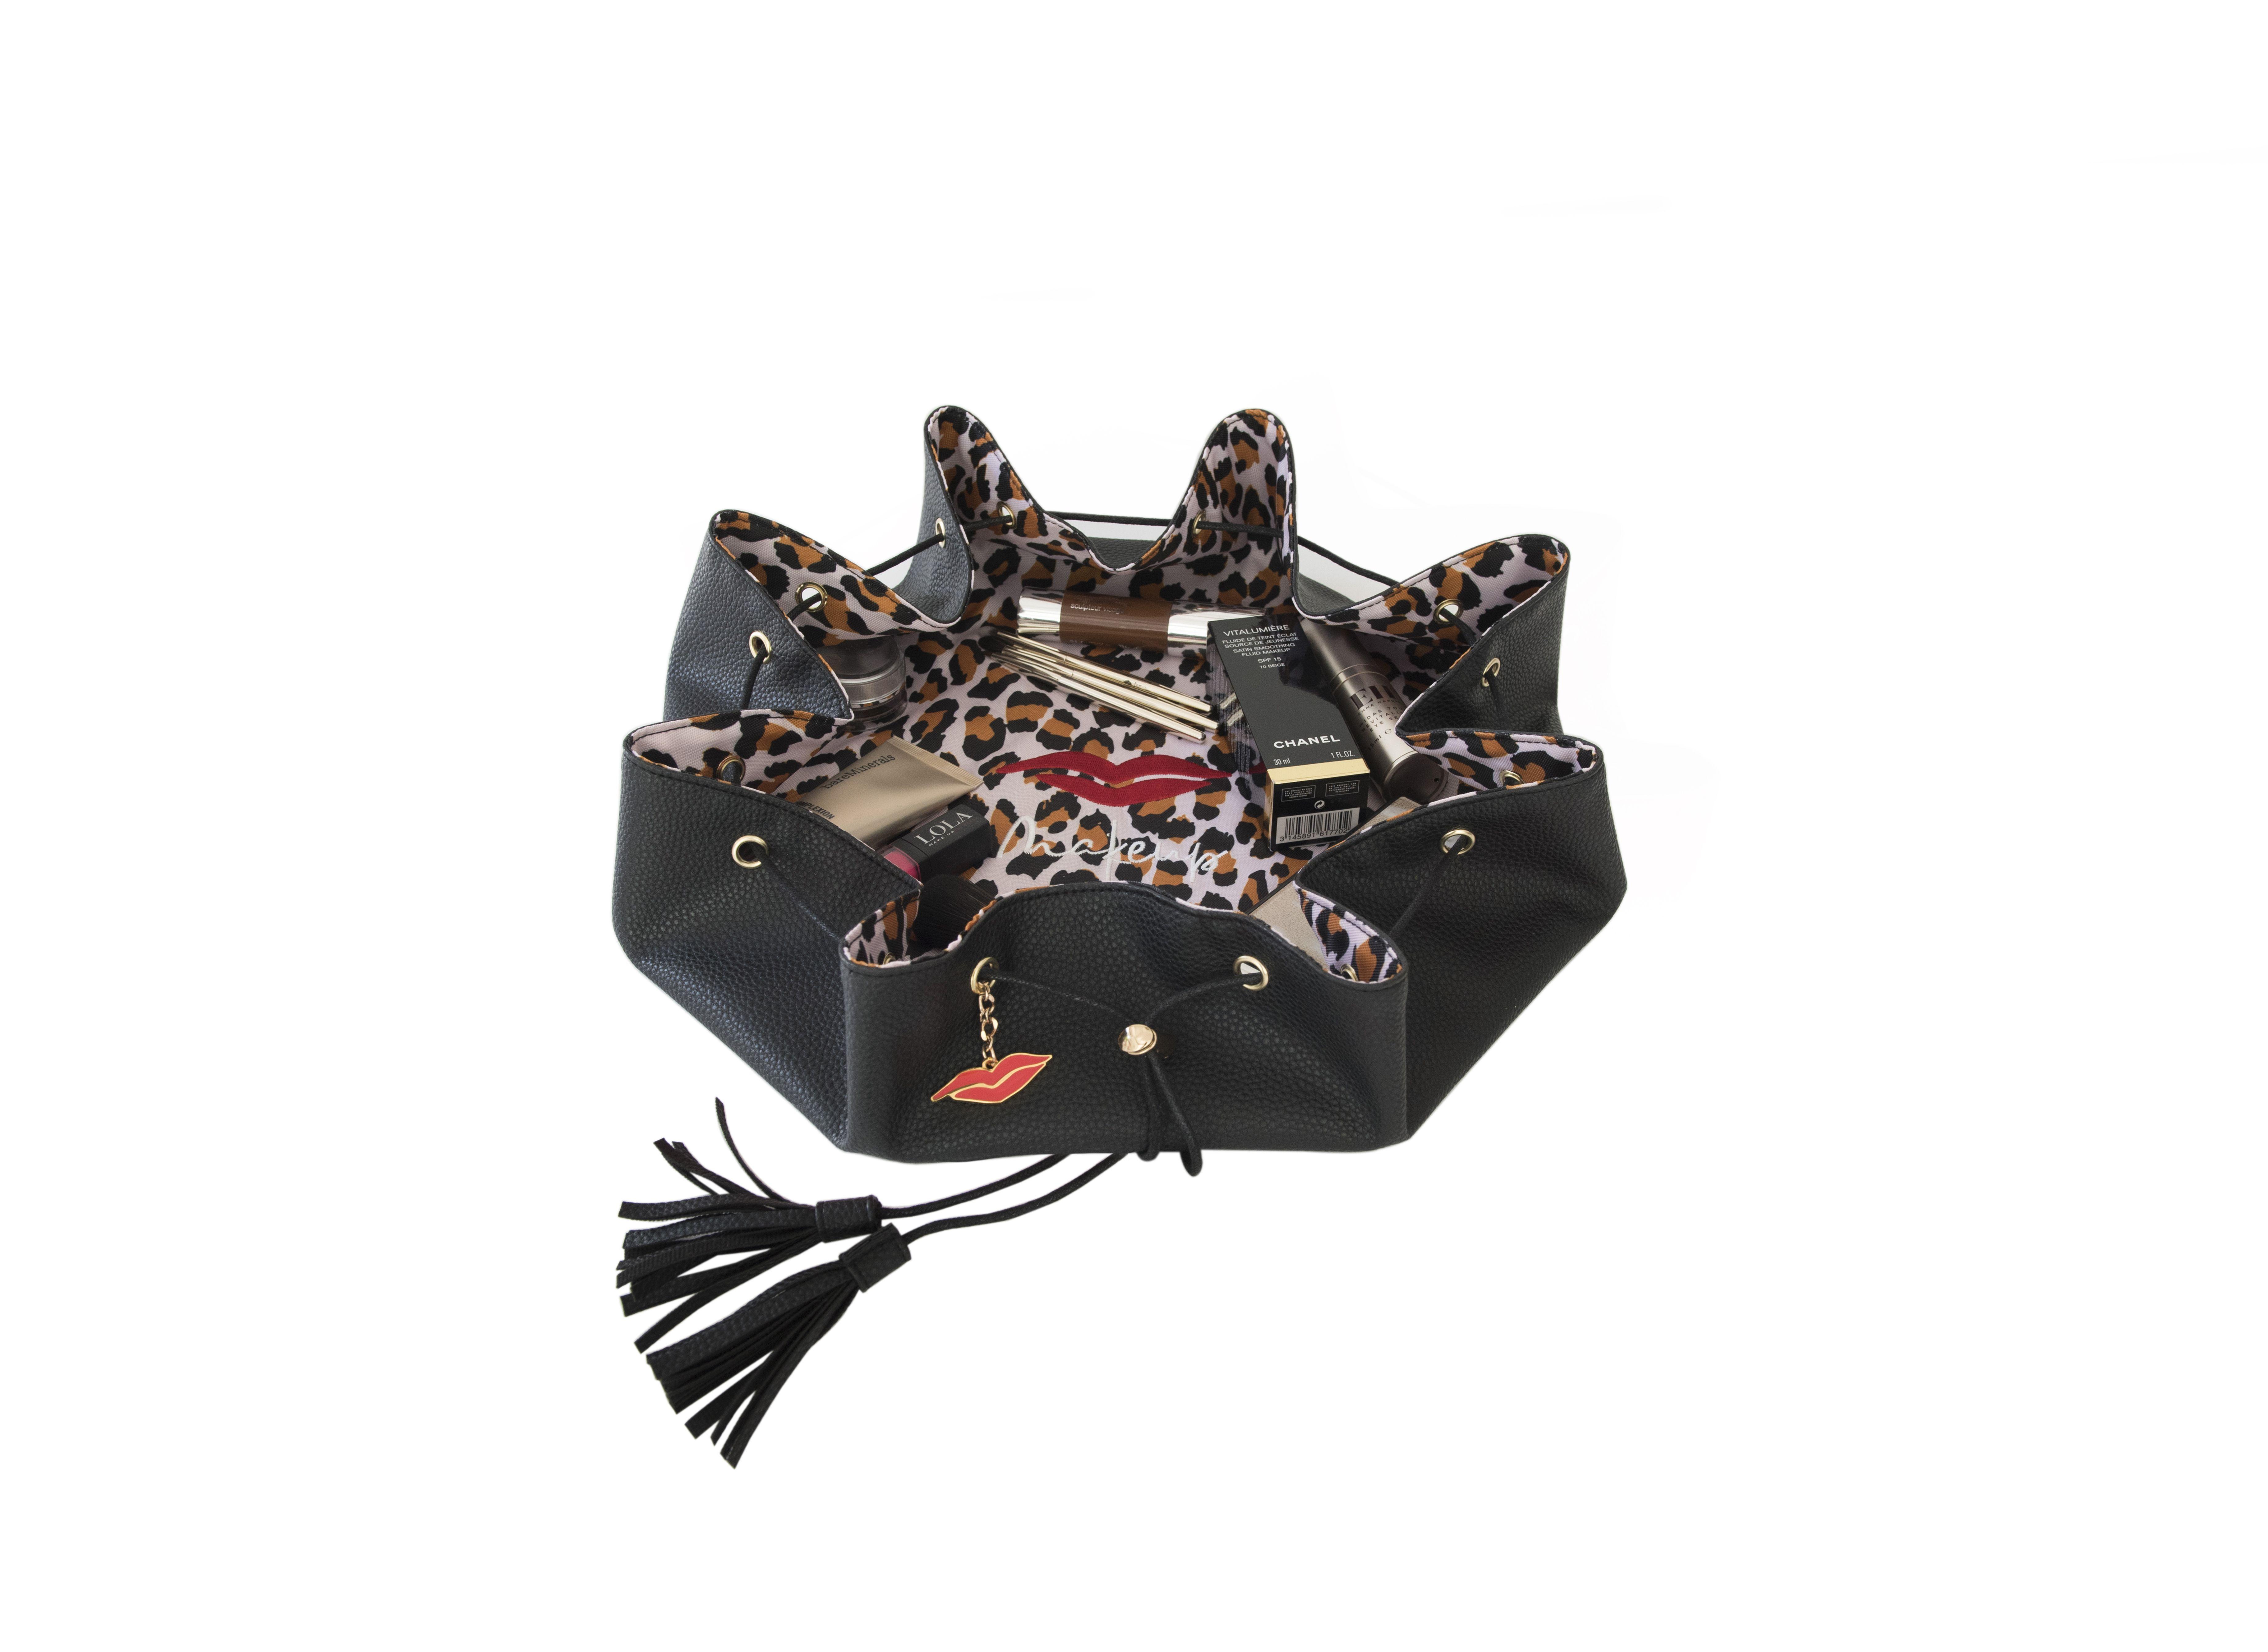 Black & Leopard Print Drawstring Makeup Bag Vegan